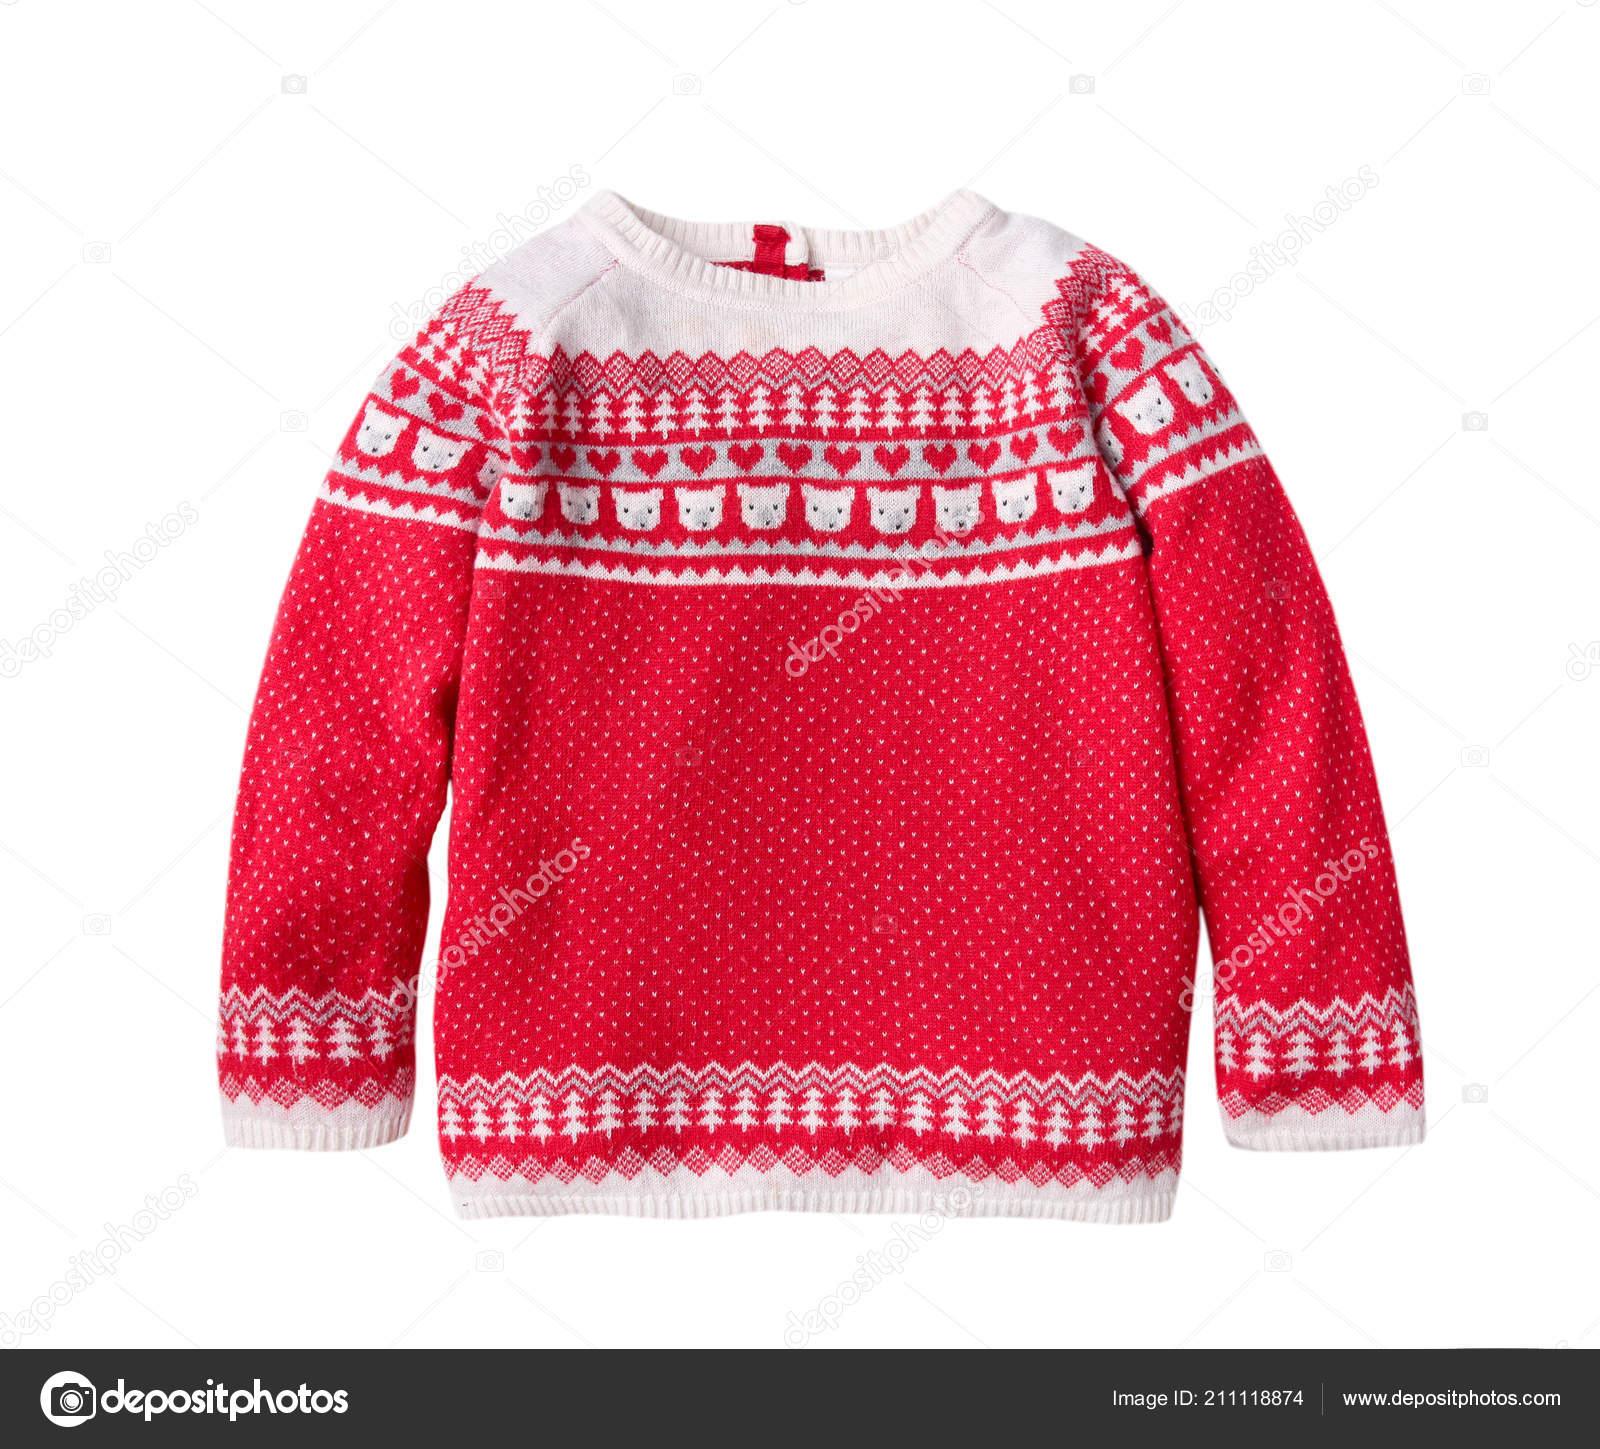 b8ae619014e6 Του παιδιού Χριστούγεννα κόκκινο διακοσμημένους πουλόβερ απομονωμένες